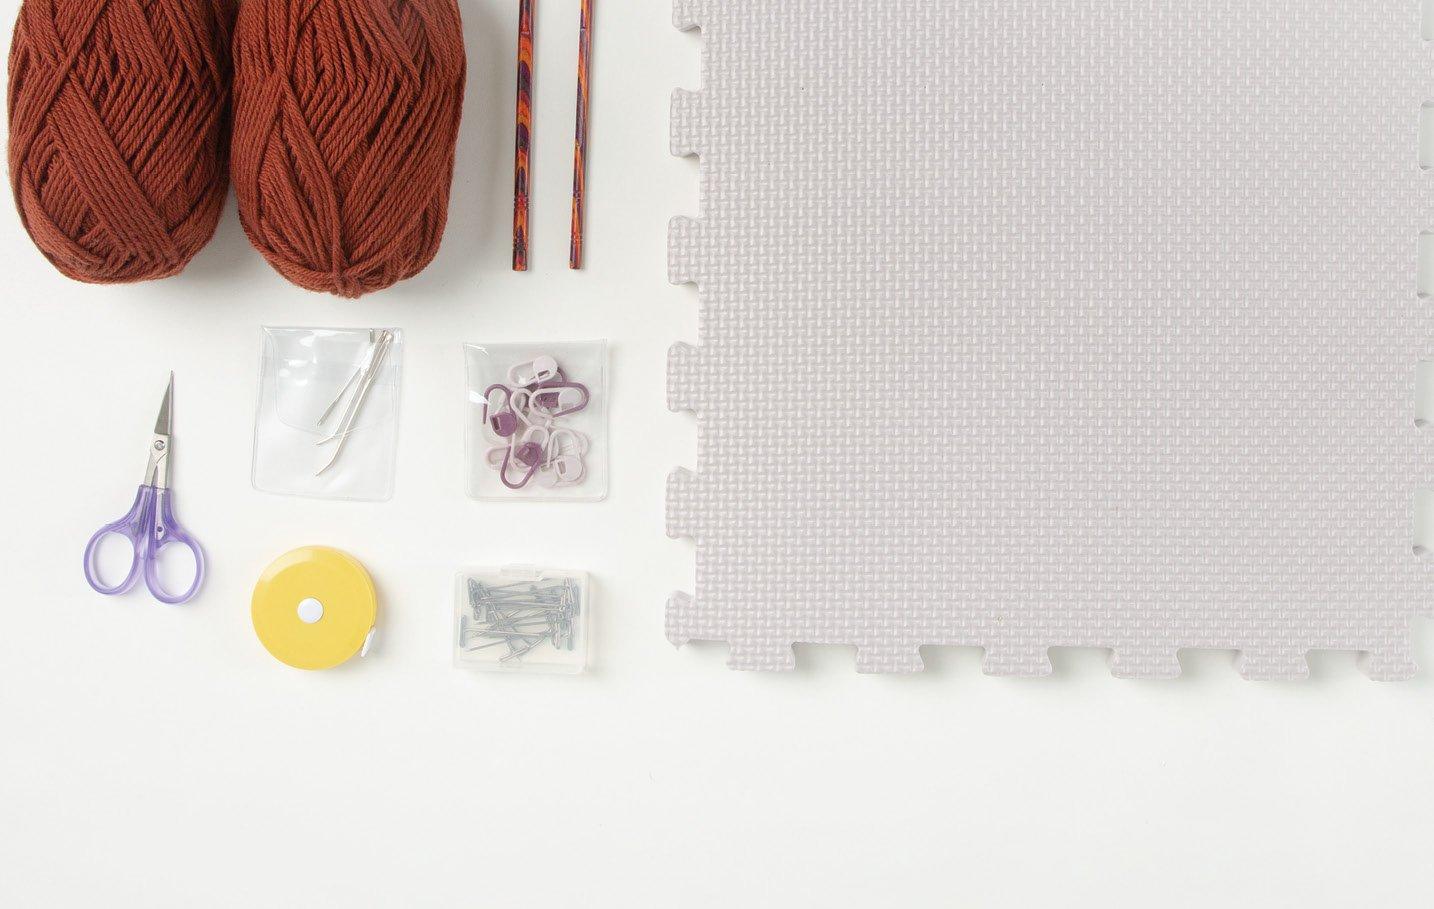 Bright Creativebug Kit